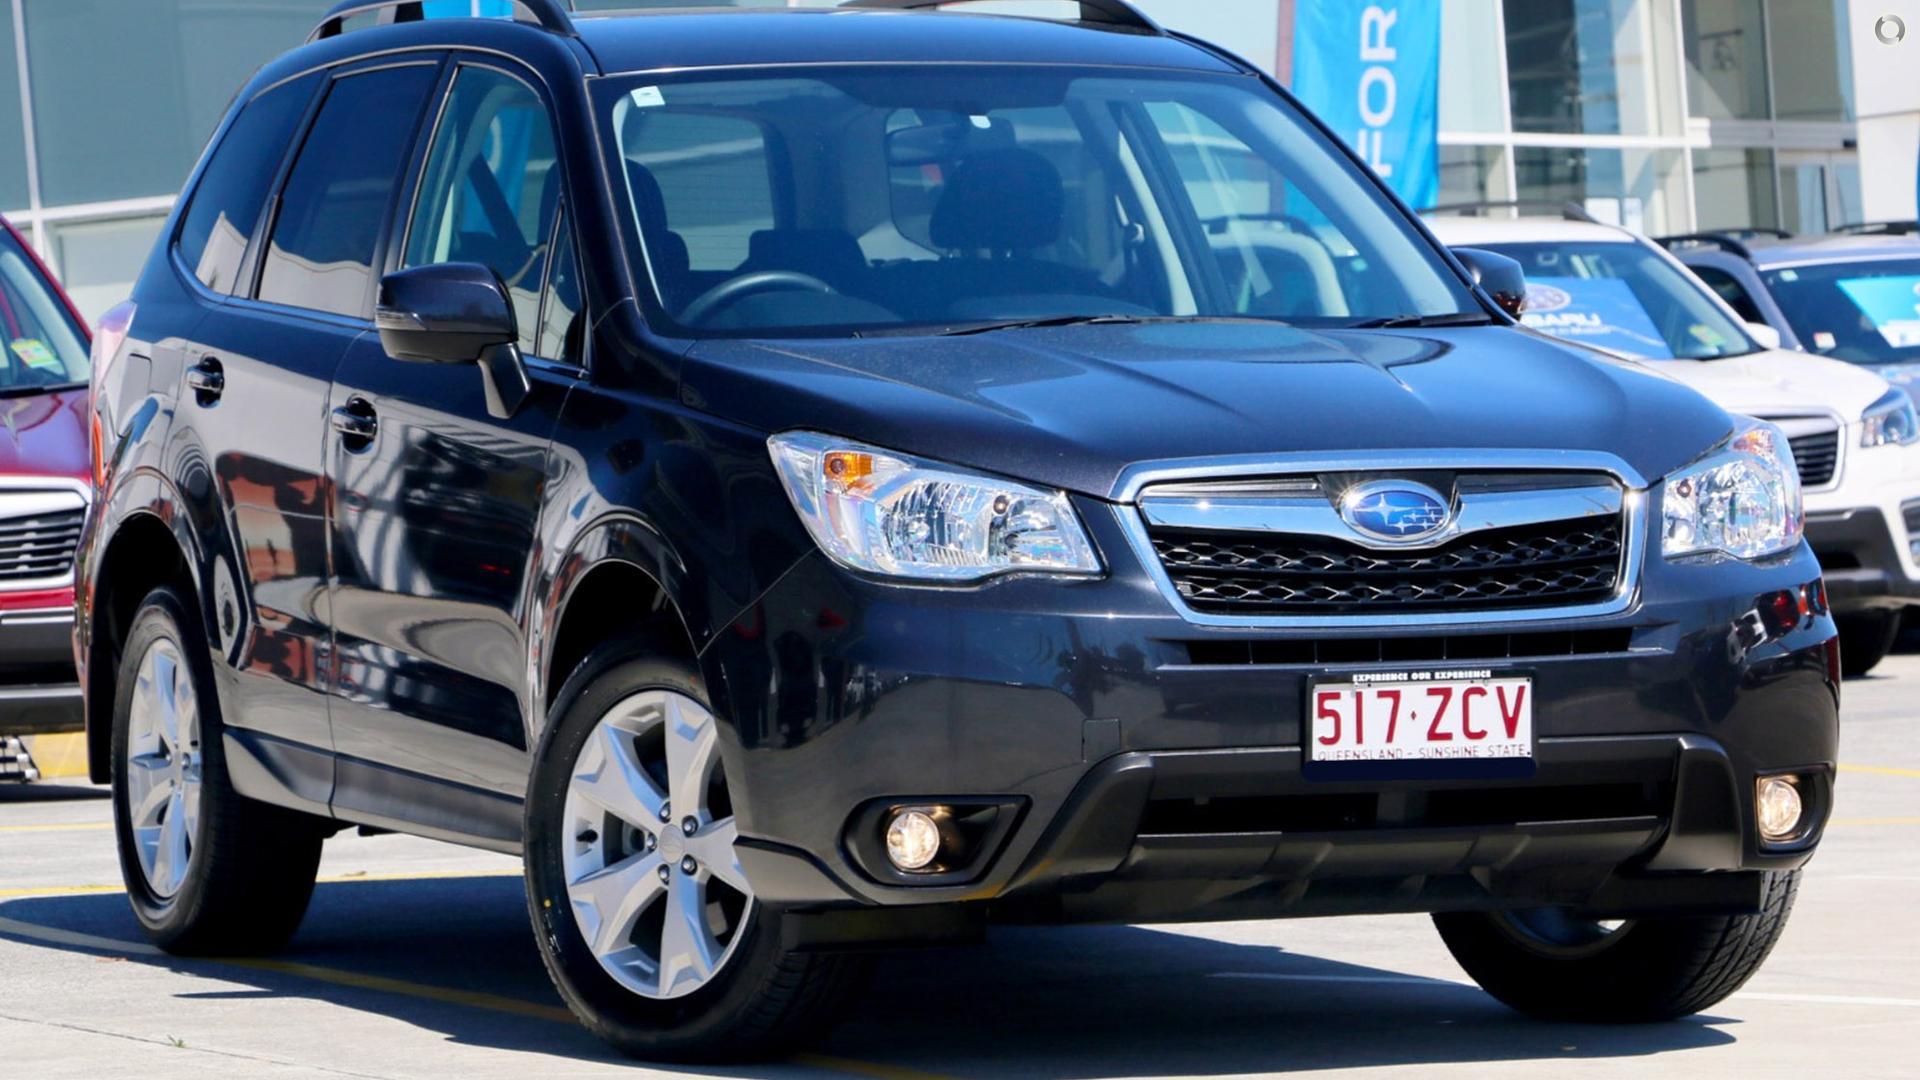 2013 Subaru Forester S4